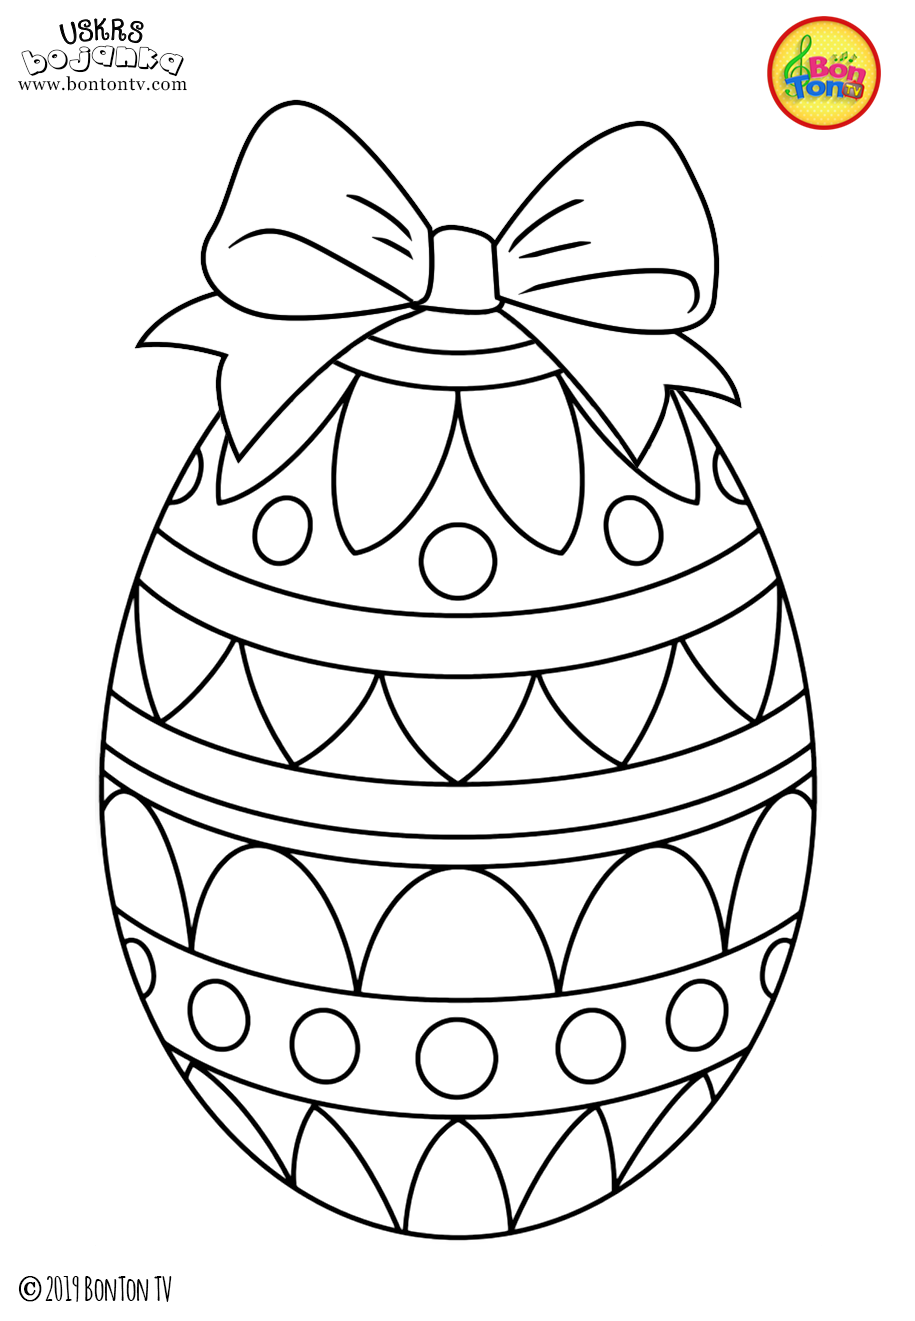 Free Easter Coloring Pages Uskrs Bojanke Za Djecu Free Printables Easter Bunny Eggs Chicks And More On Bonton Tv Coloring Kolorowanki Rekodzielo I Do Wydrukowania